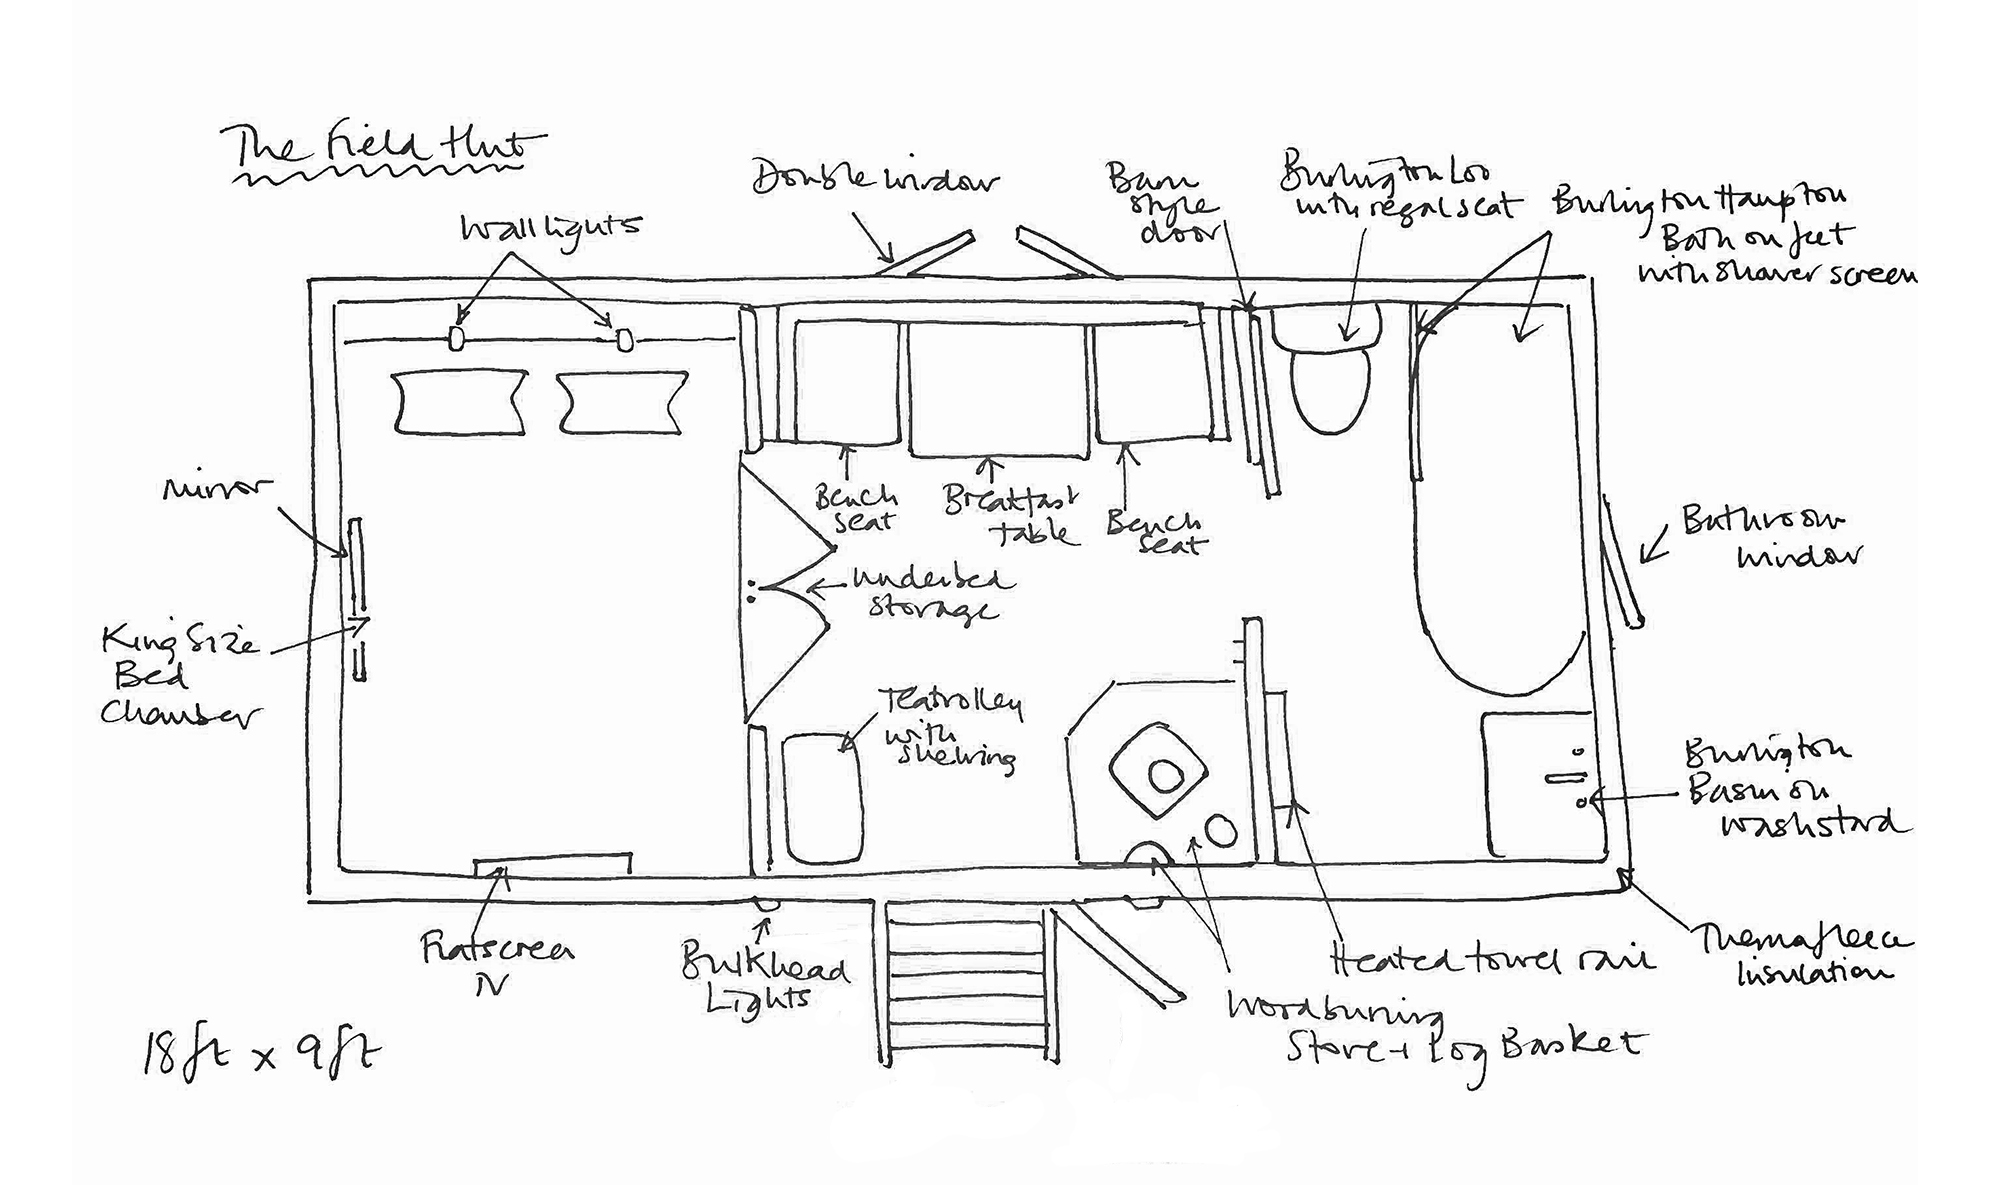 Field hut dimension sketch 2.jpg